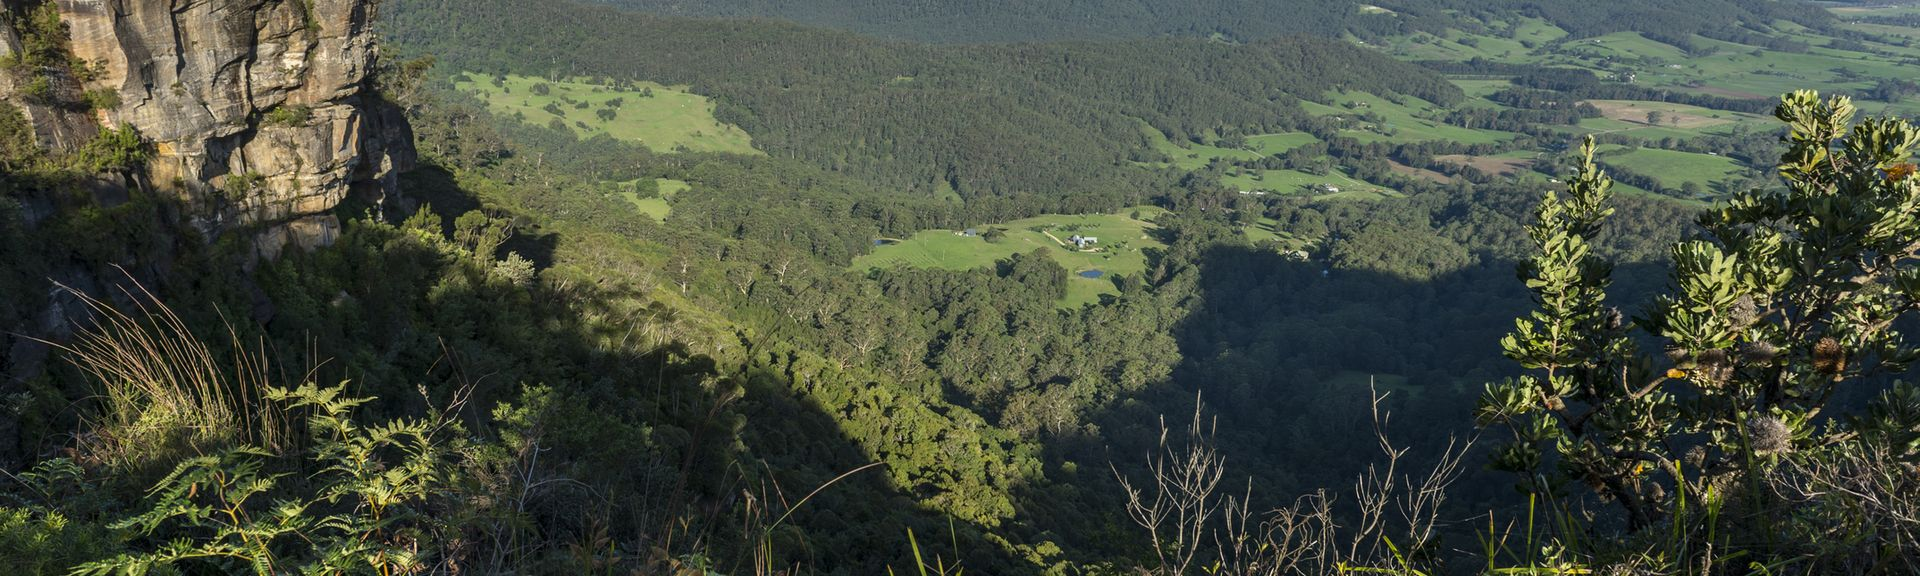 Kangaroo Valley, New South Wales, Australia